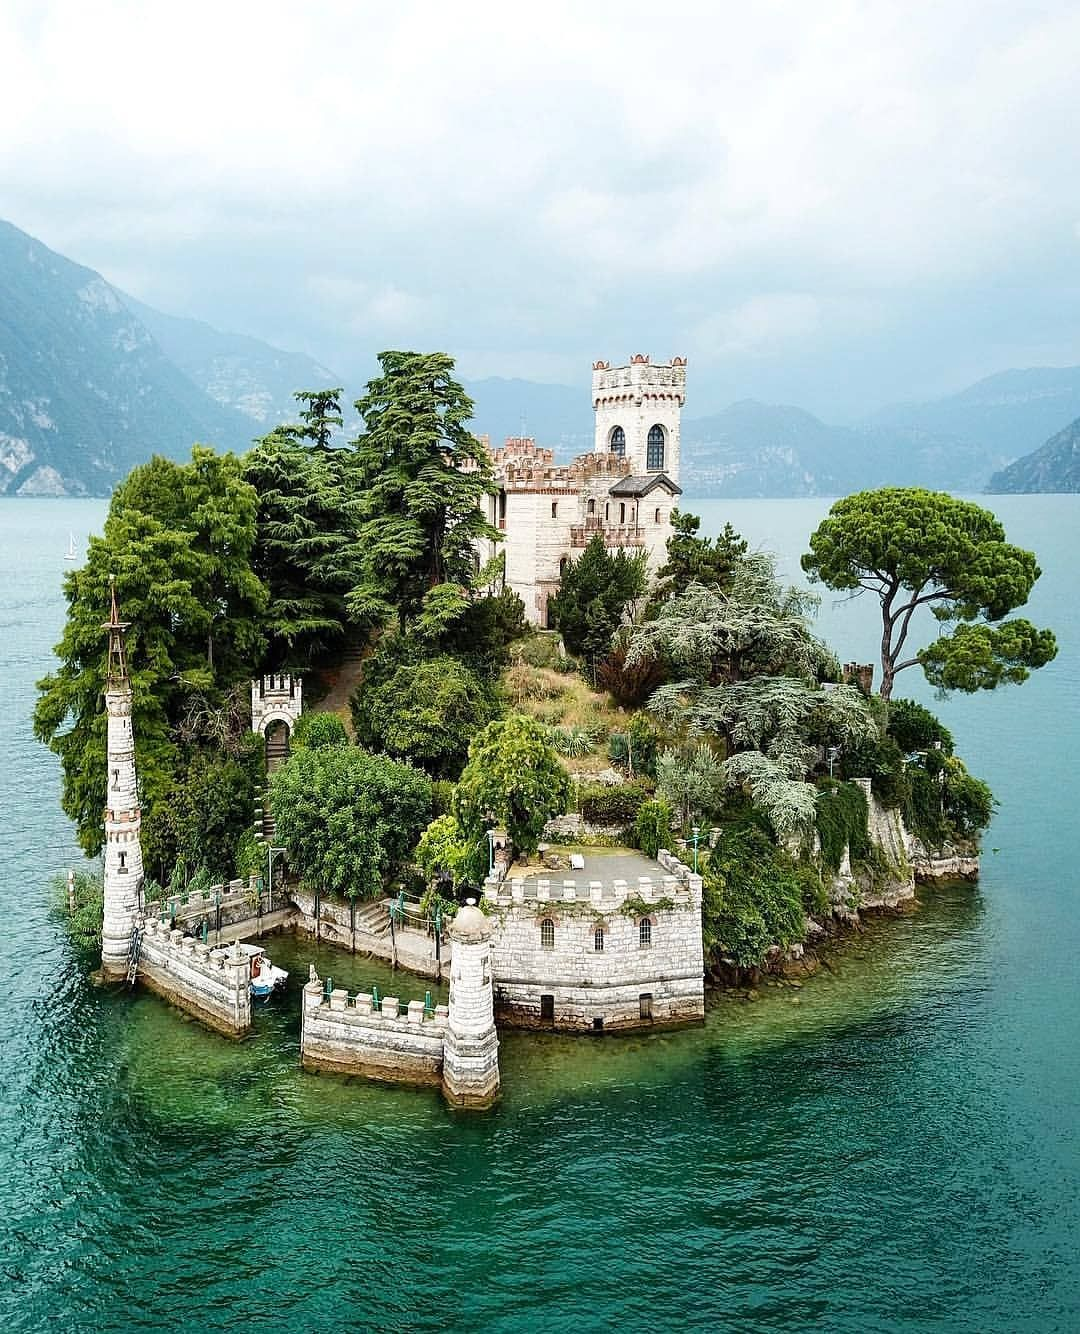 "Photo of ᴘᴇʀғᴇᴄᴛ ɪᴛᴀʟɪᴀ 🇮🇹 on Instagram: ""Travel to #IsoladiLoreto! ❤️🇮🇹 Photo by: @mogyimarci. Congratulations 👏🏻👏🏻 Chosen by: @stavros.soultanias . #perfect_italia…"""